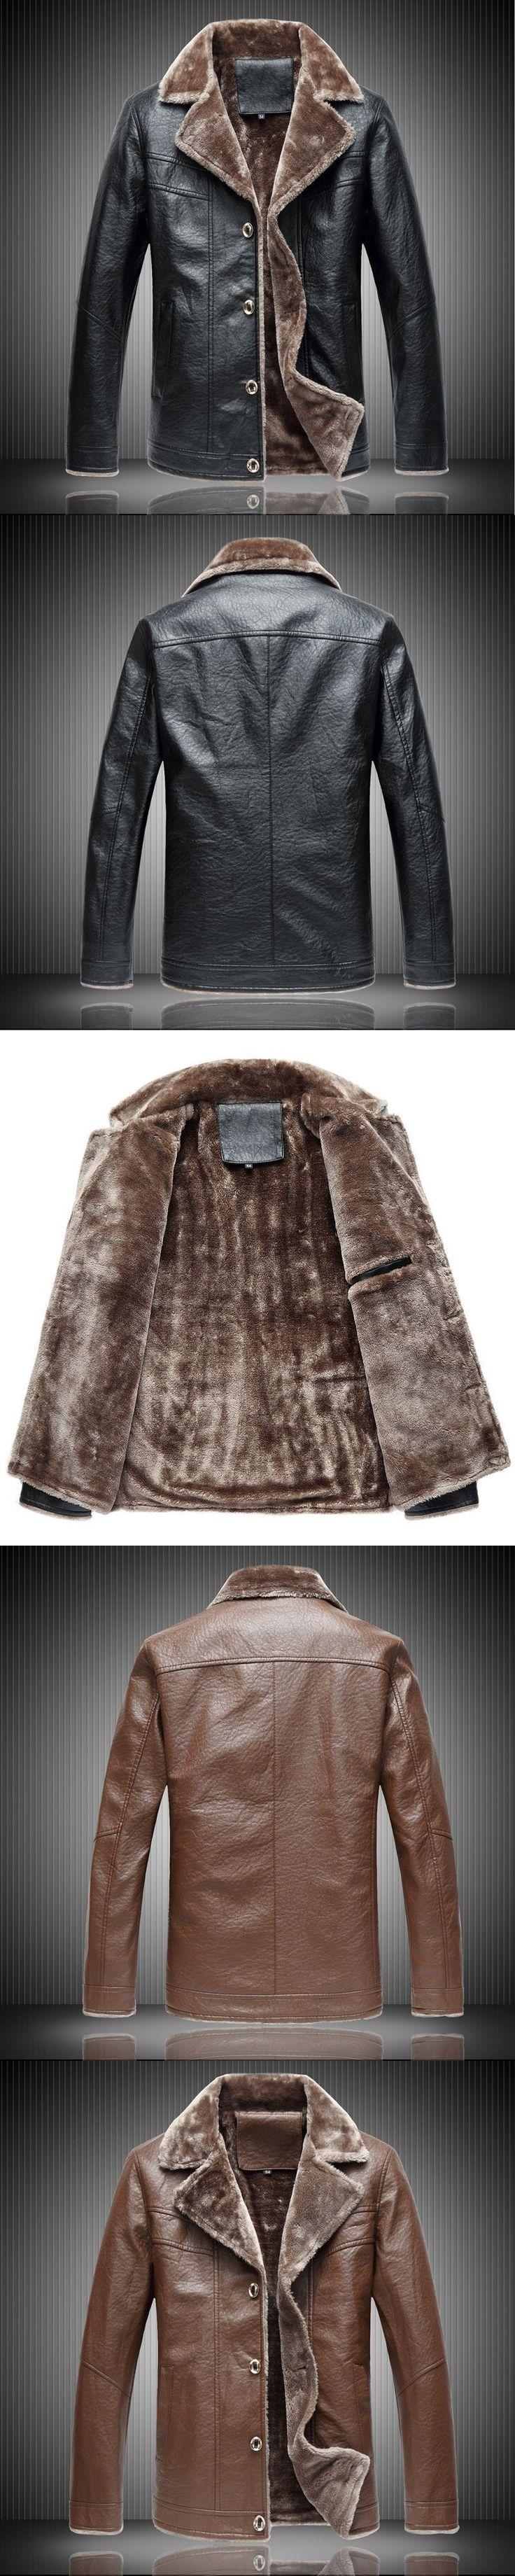 Brand High Quality Mens Faux Fur Coats Fashion Winter Warm Jacket Men Brown Red Black Men Leather Jacket Winter Plus Size 5xl